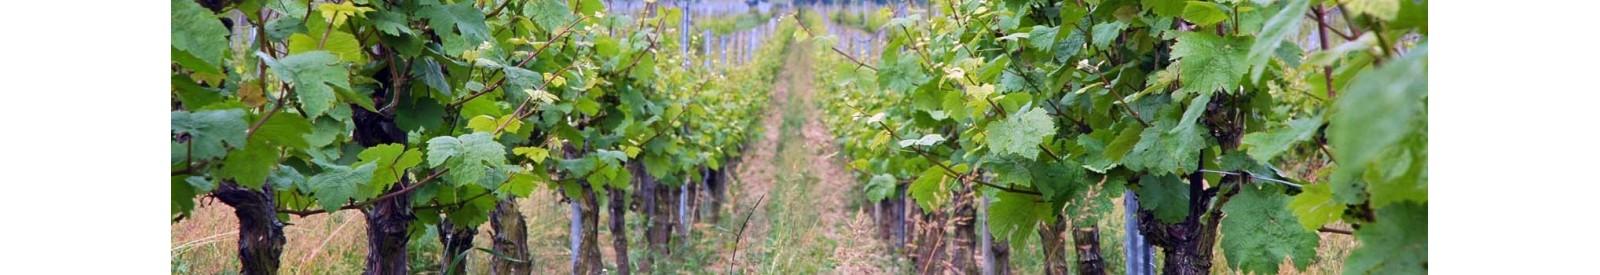 Hubert et Heidi Hausherr - Alsace - Organic wine